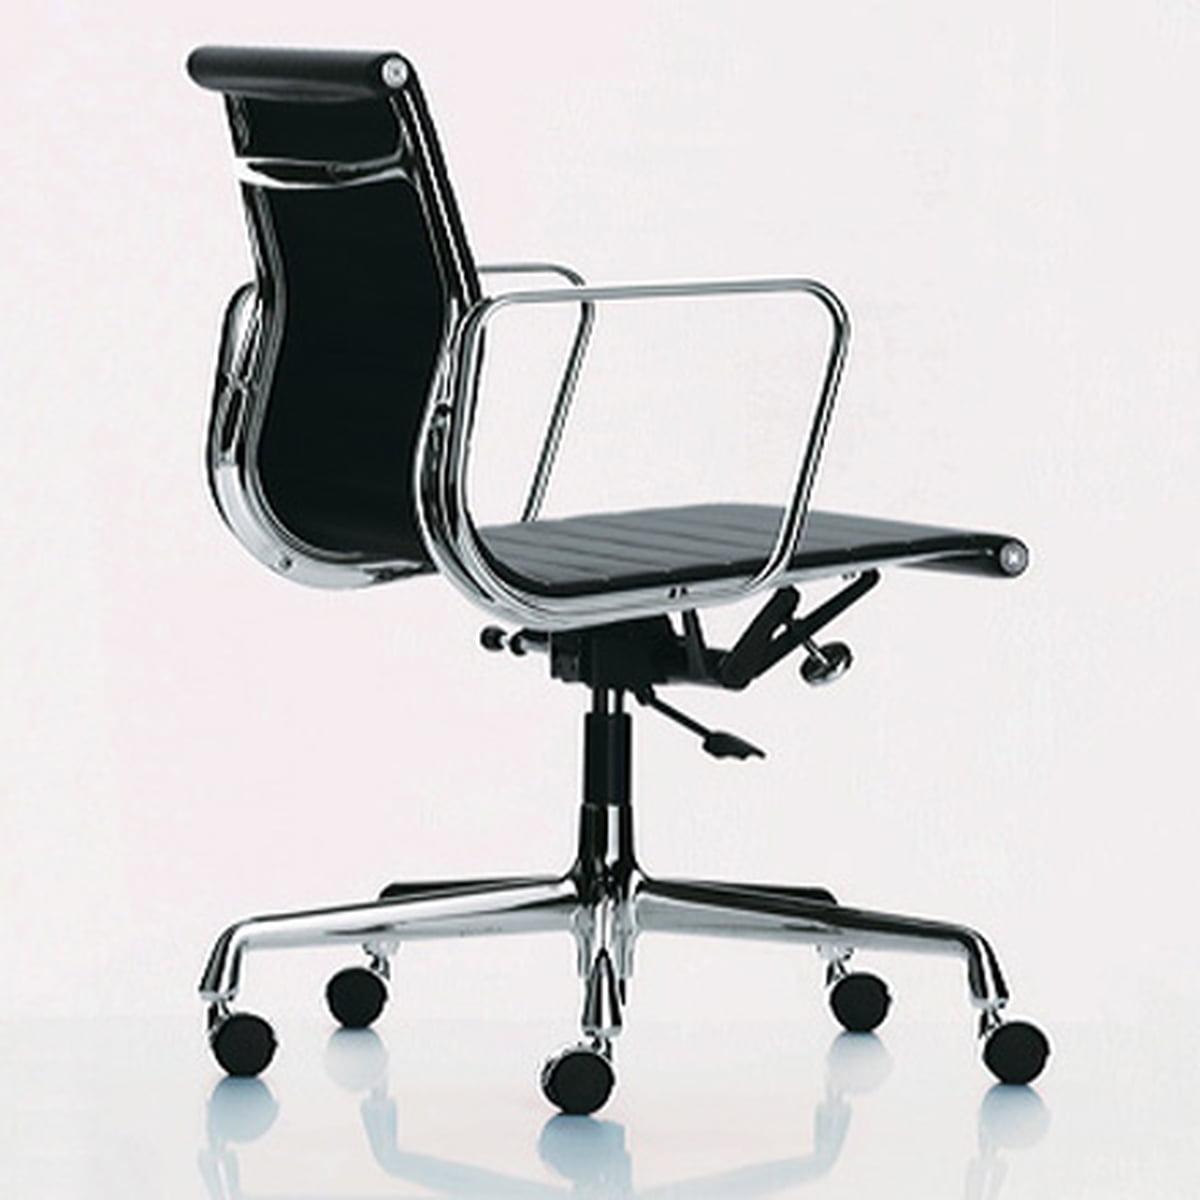 Vitra Schreibtischstuhl aluminium ea 117 bürostuhl vitra connox